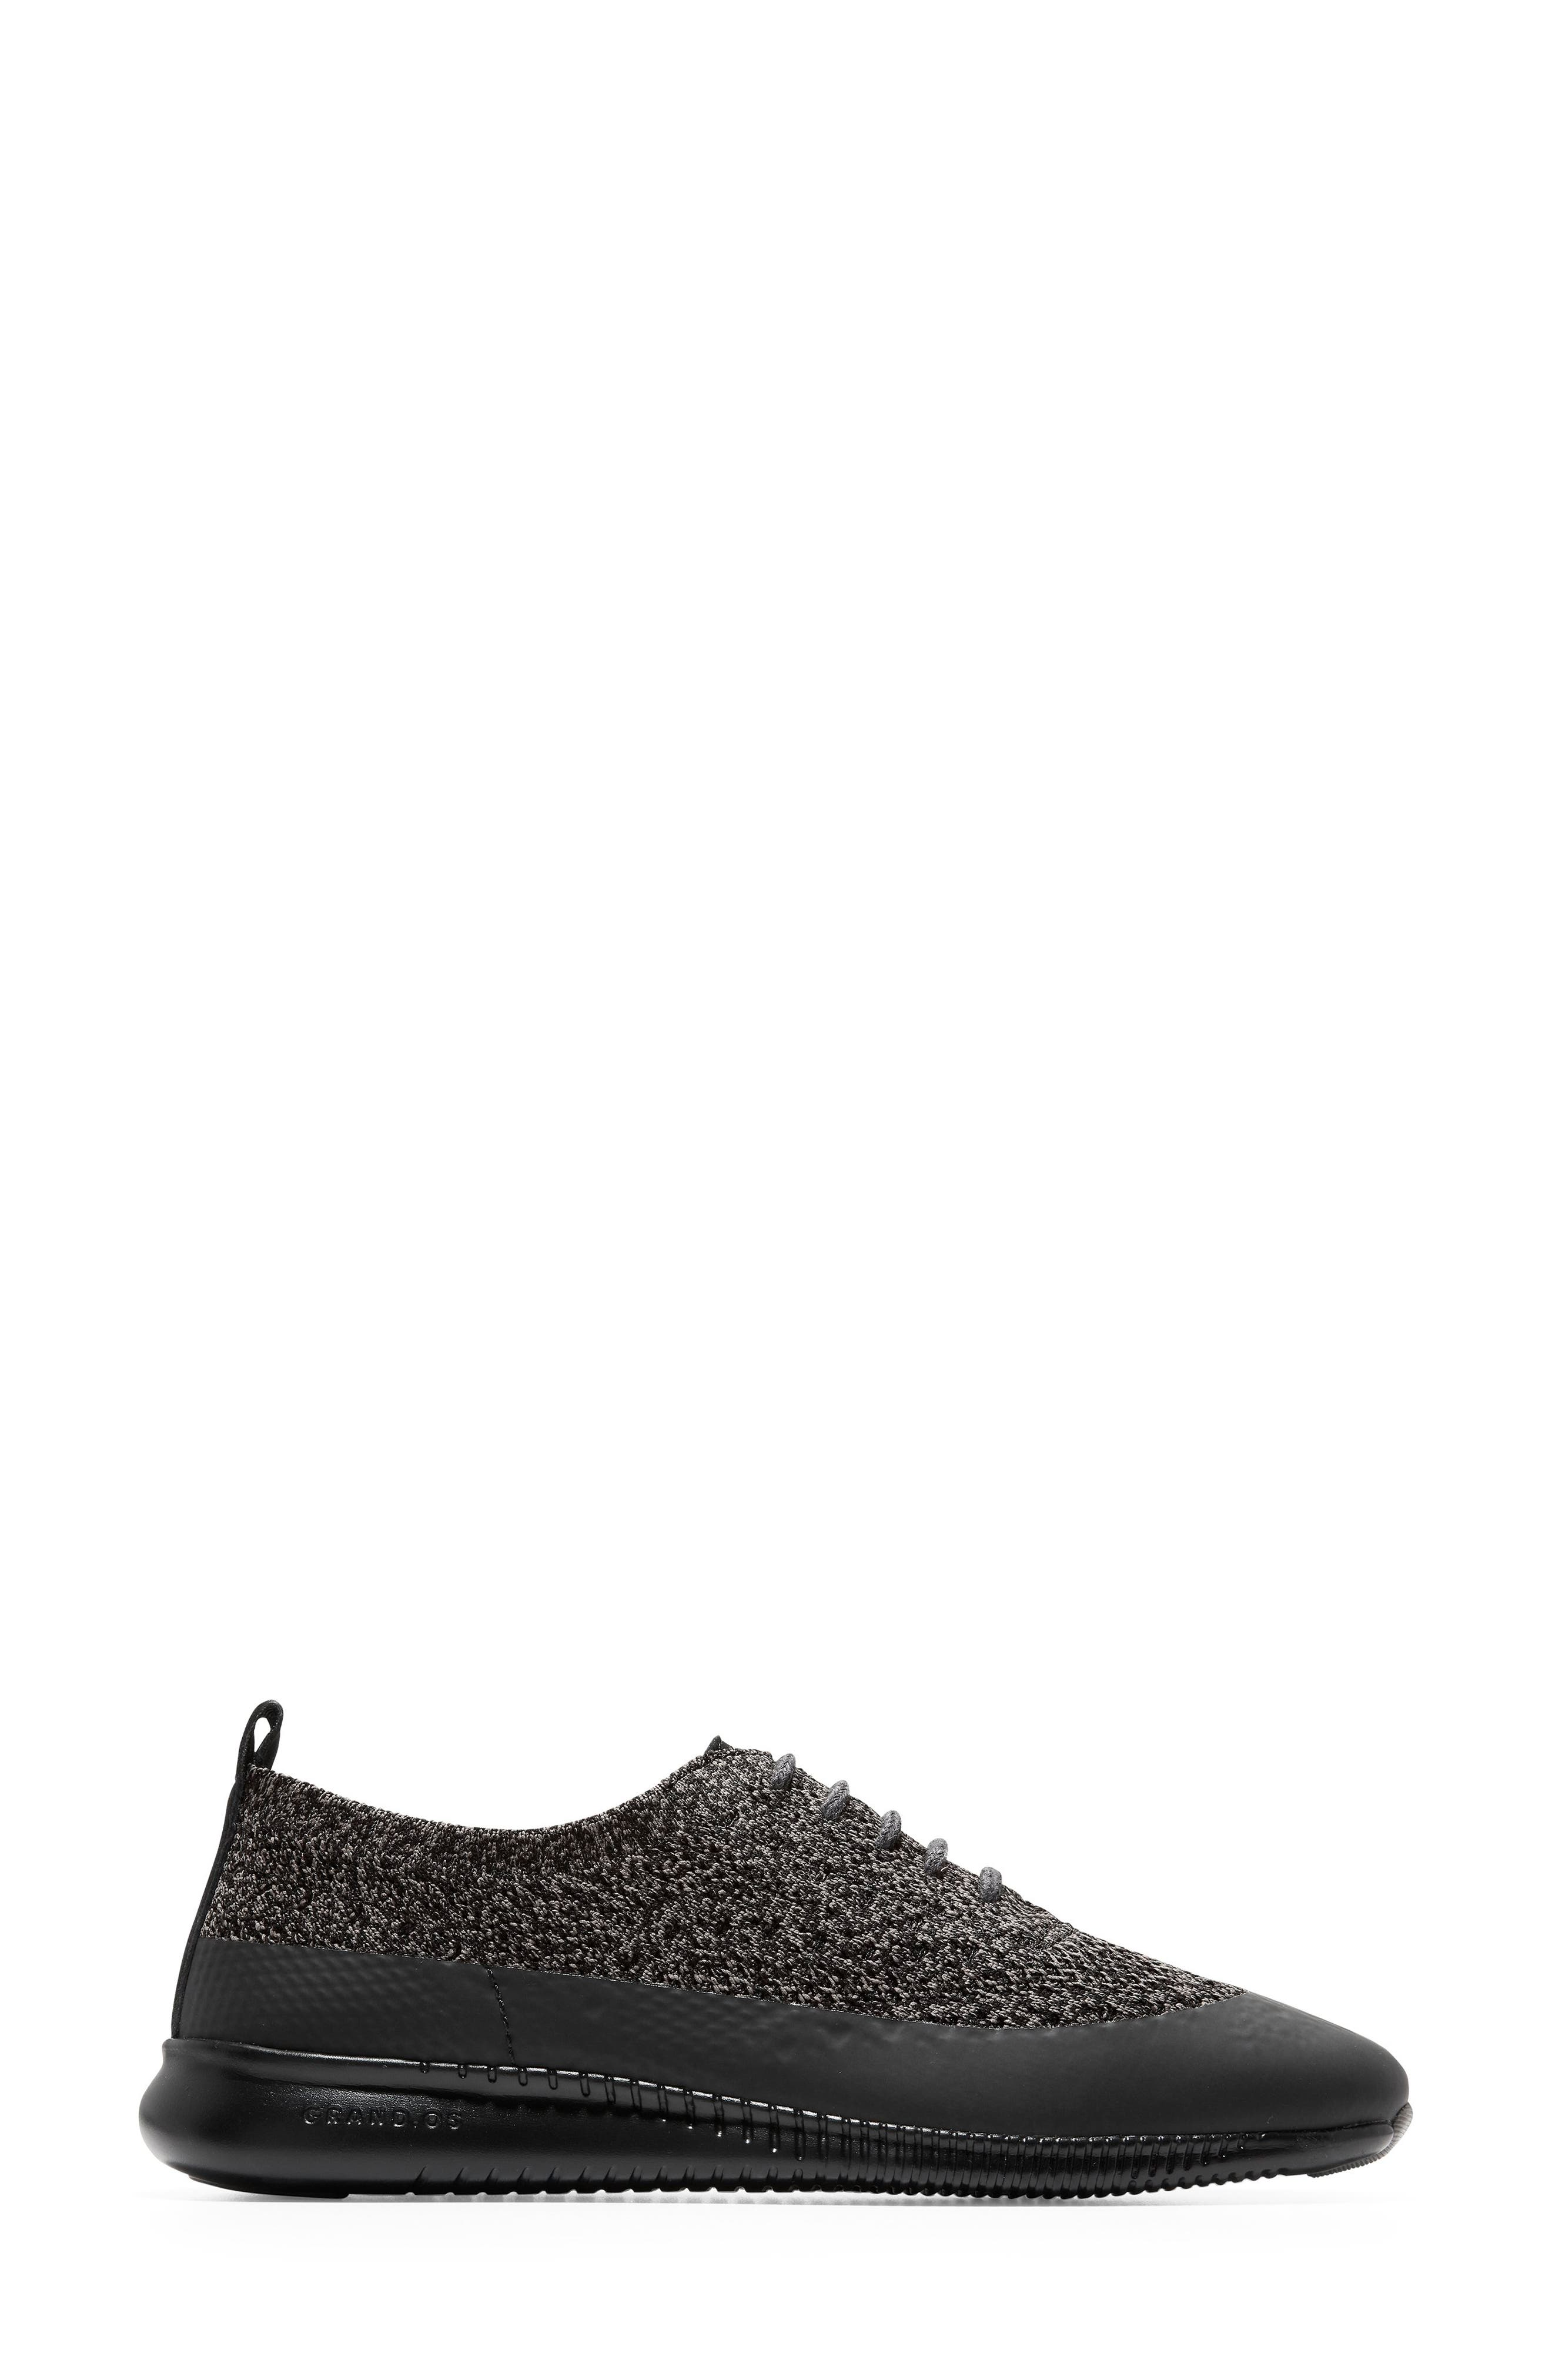 2 Zerogrand Stitchlite Oxford Sneaker,                             Alternate thumbnail 3, color,                             BLACK/ STORM CLOUD KNIT FABRIC